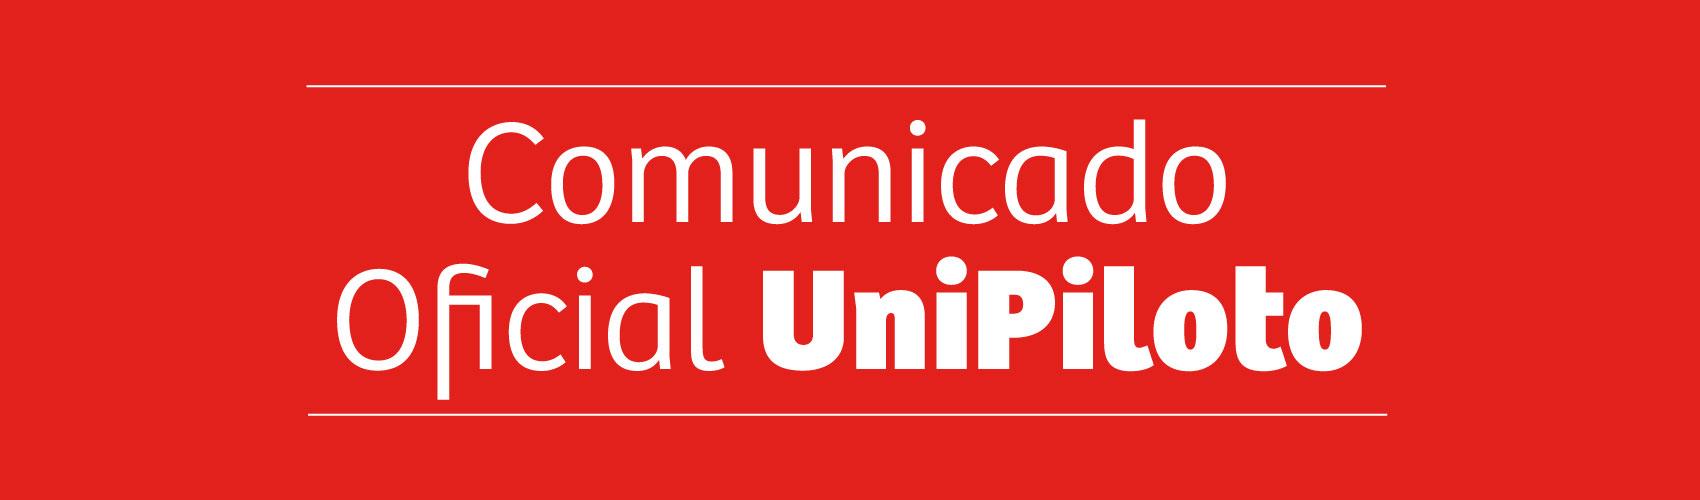 comunicado-oficial-unipiloto-b